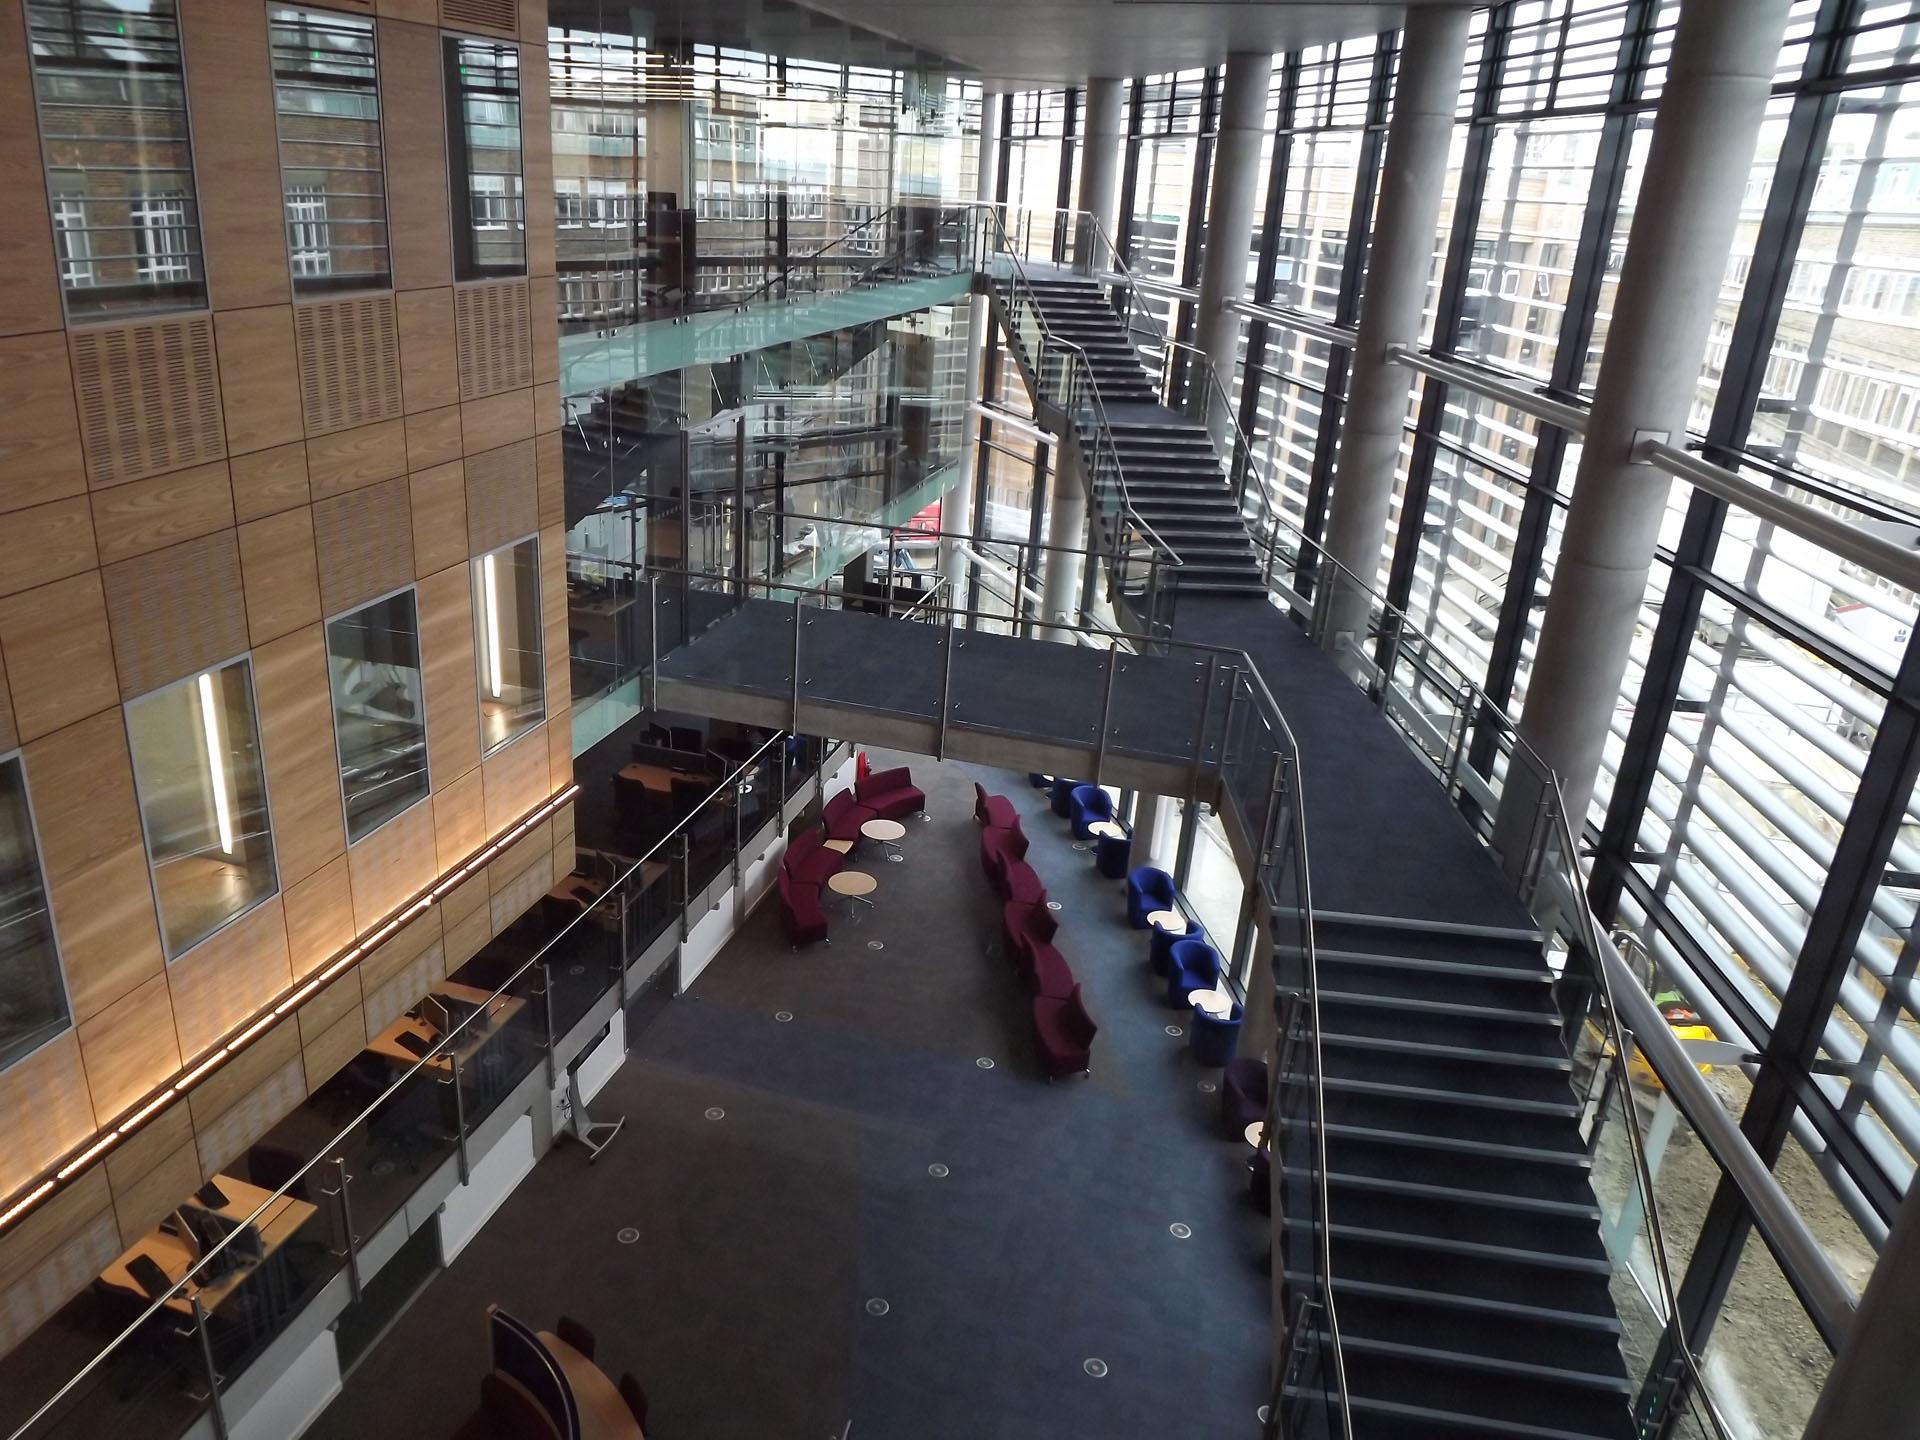 Bill Bryson Library Durham University library building architecture design interior view